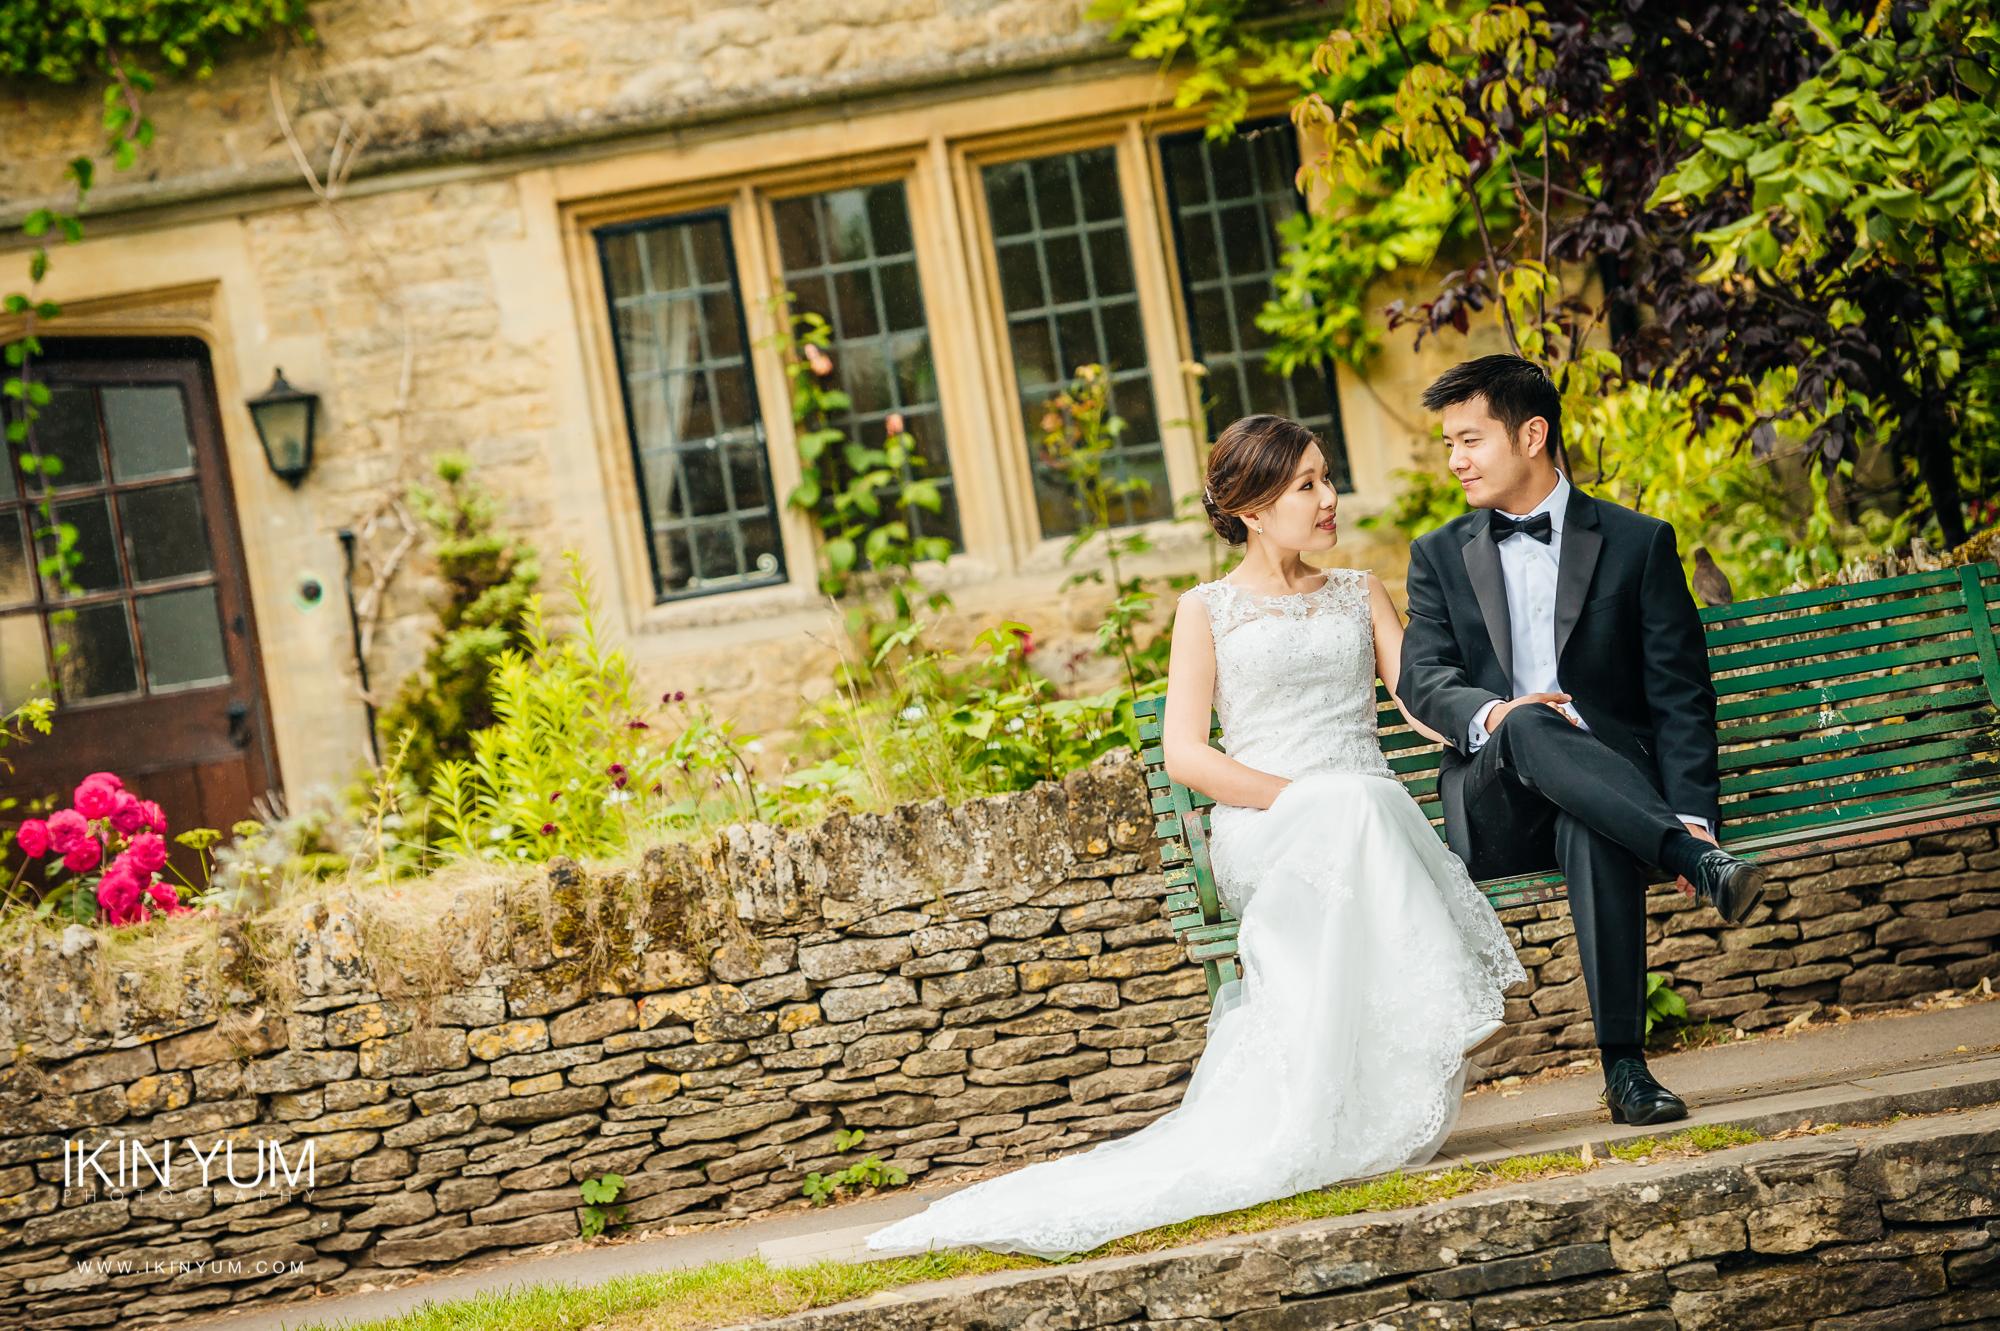 Carmen & Dennis Pre-Wedding Shoot - Ikin Yum Photography-004.jpg